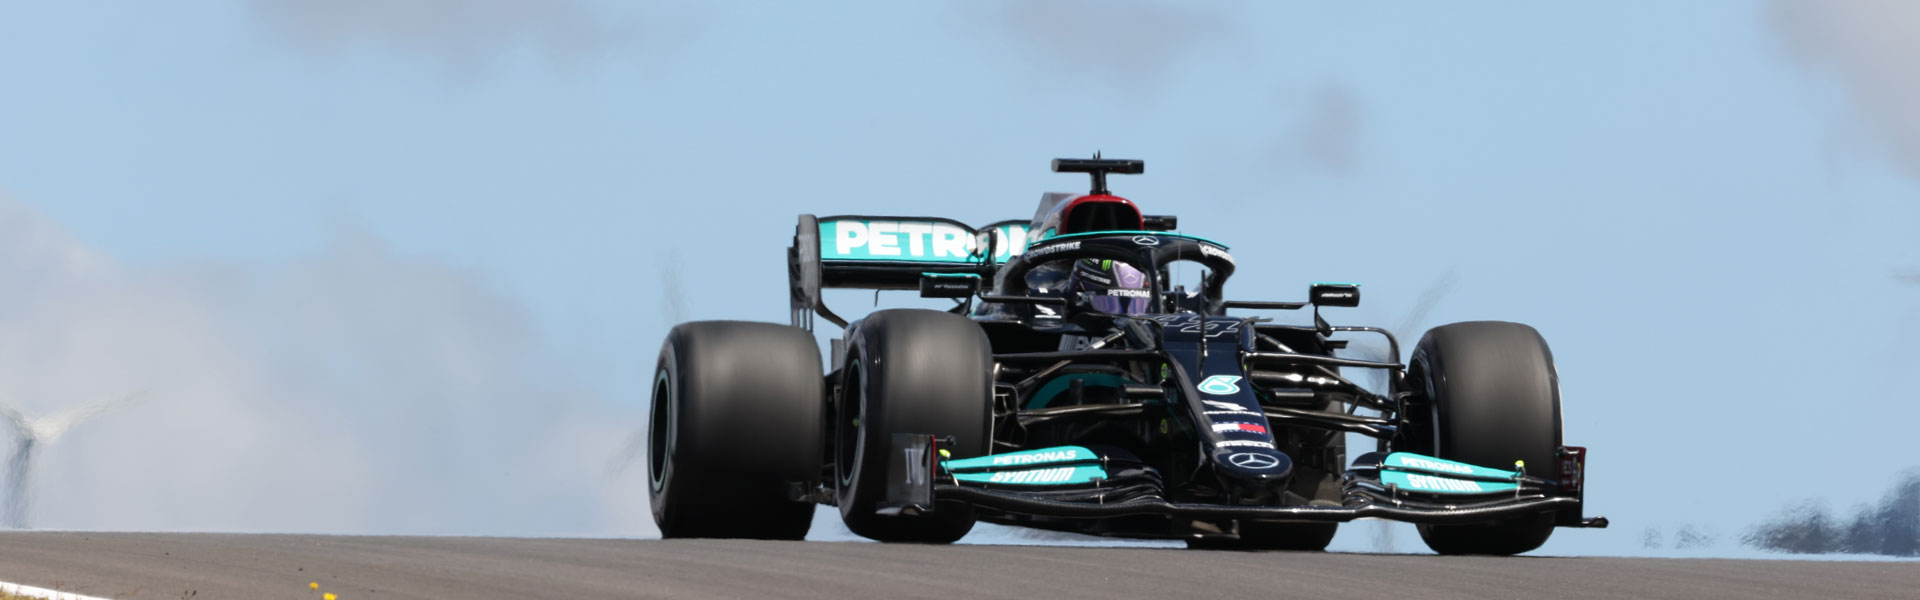 Lewis Hamilton wins the Portuguese GP!